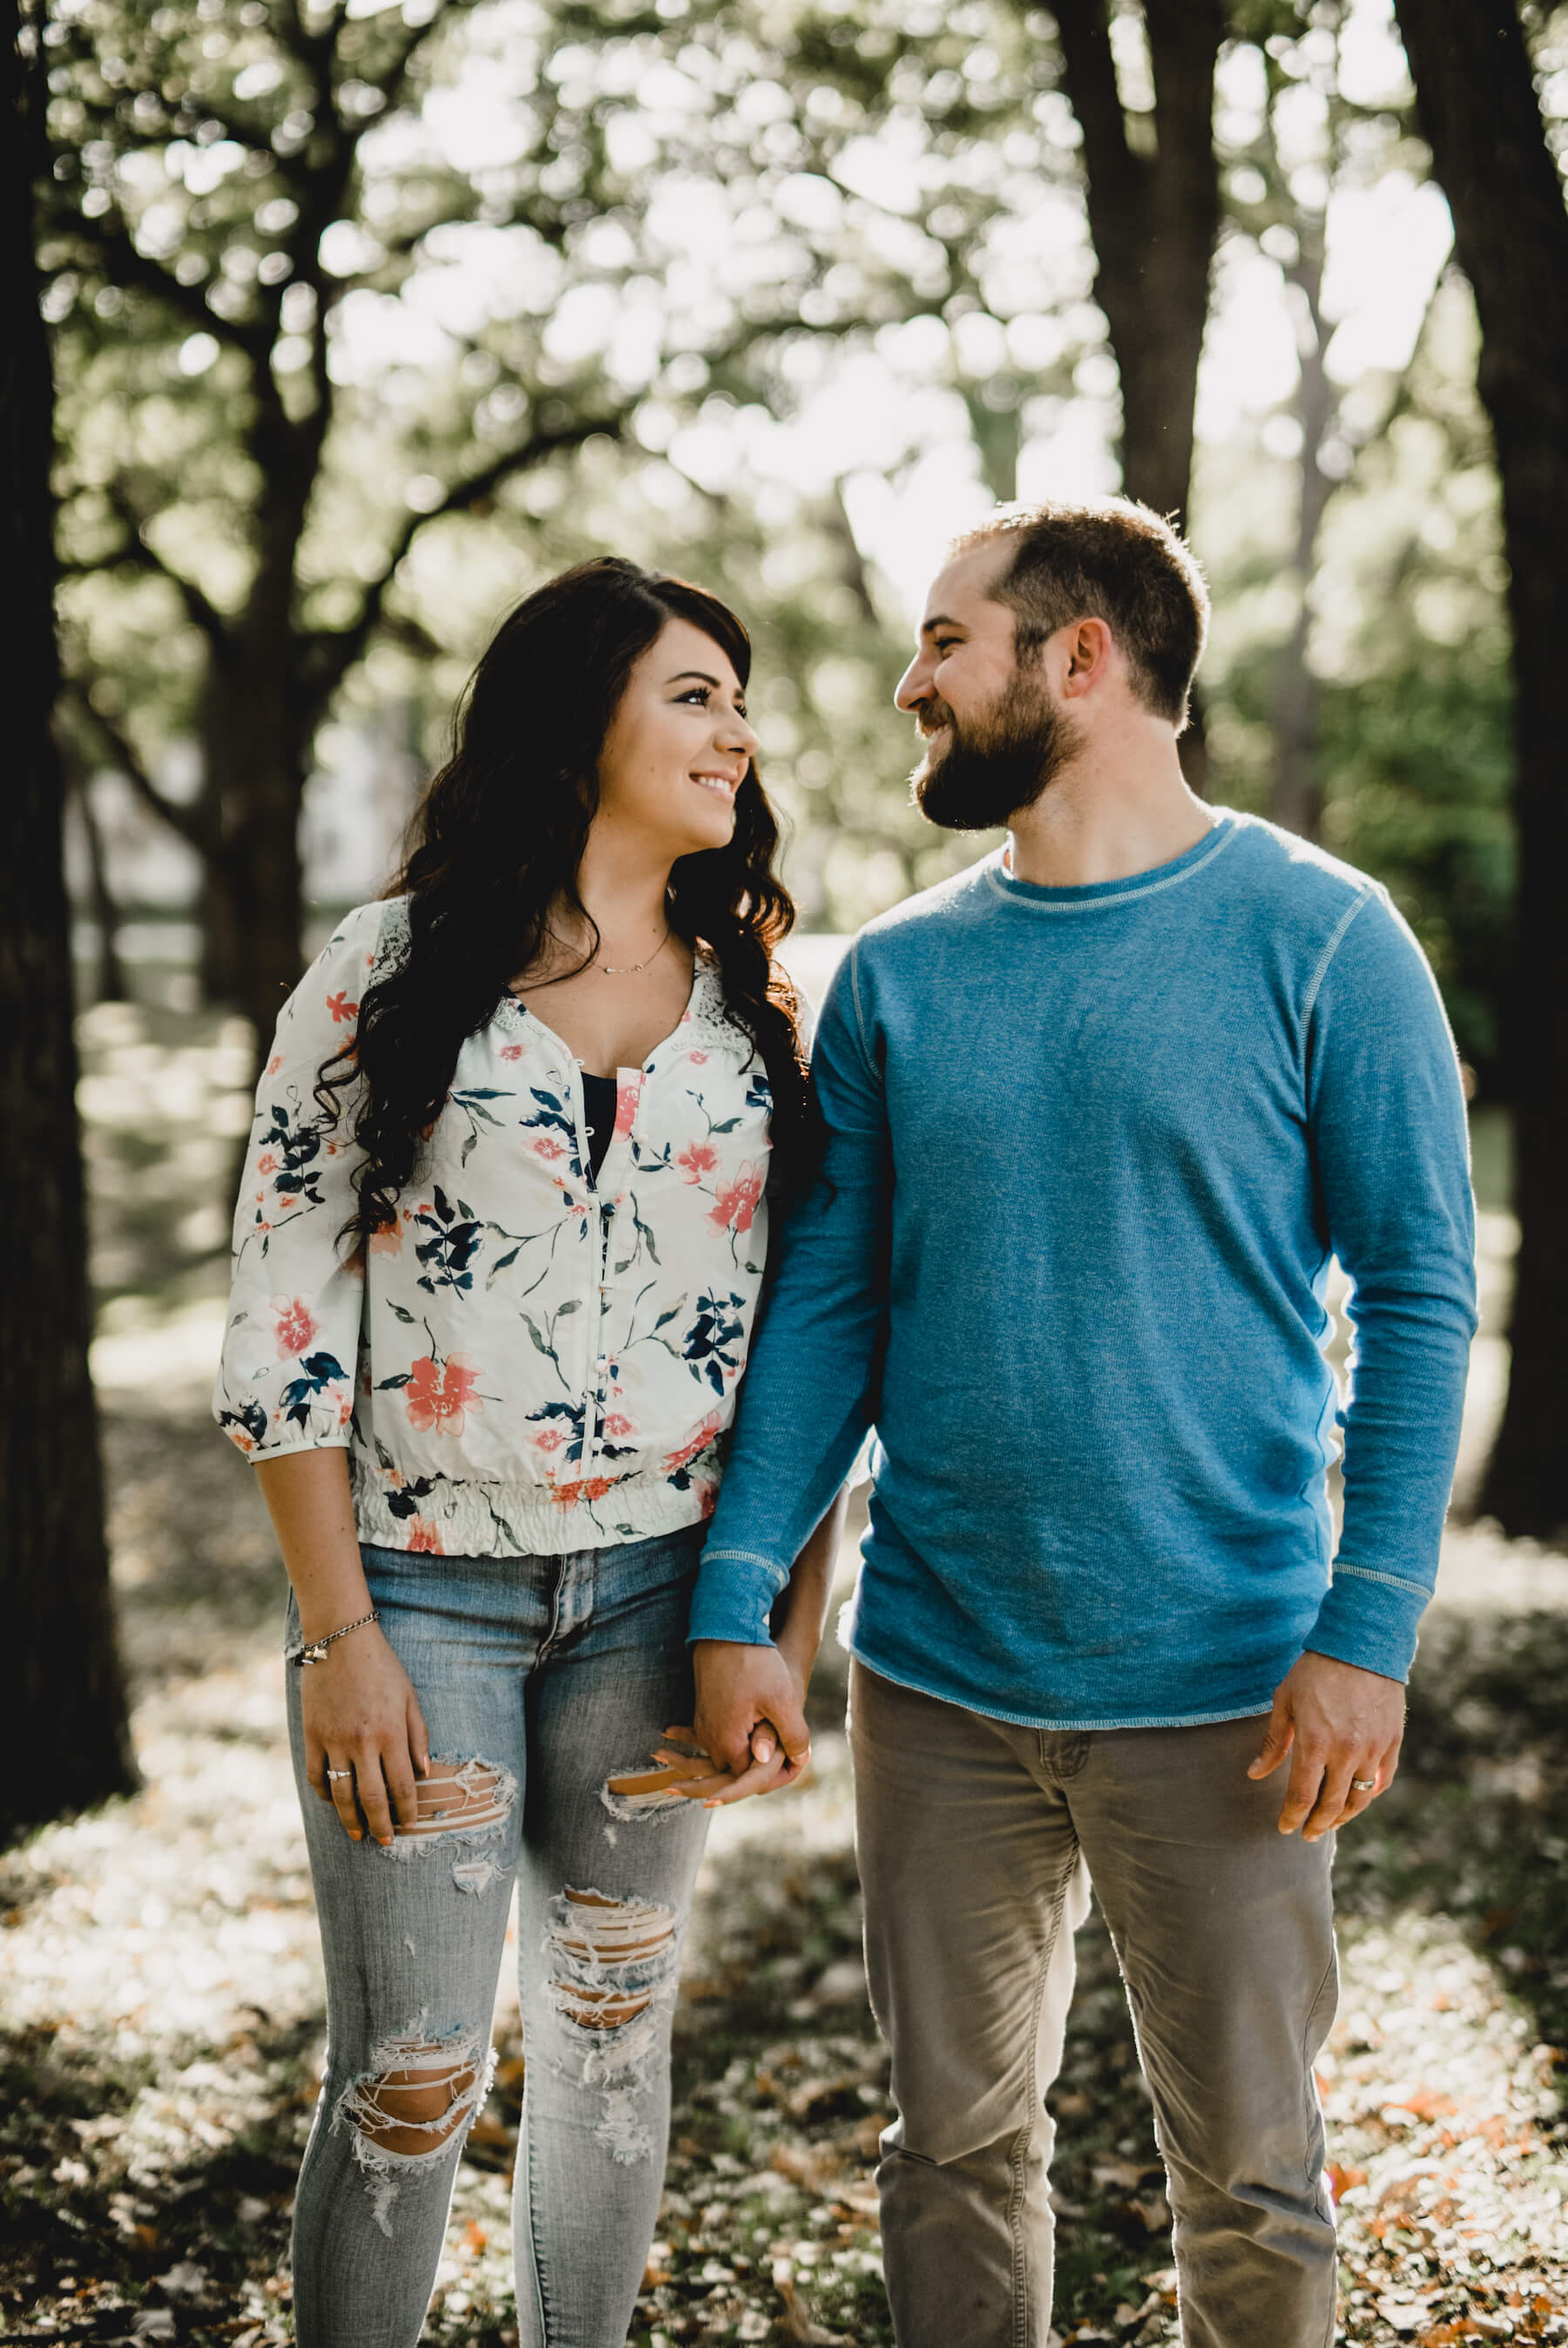 Engle-Olson-Chad-Jen-Engagement-6.jpg